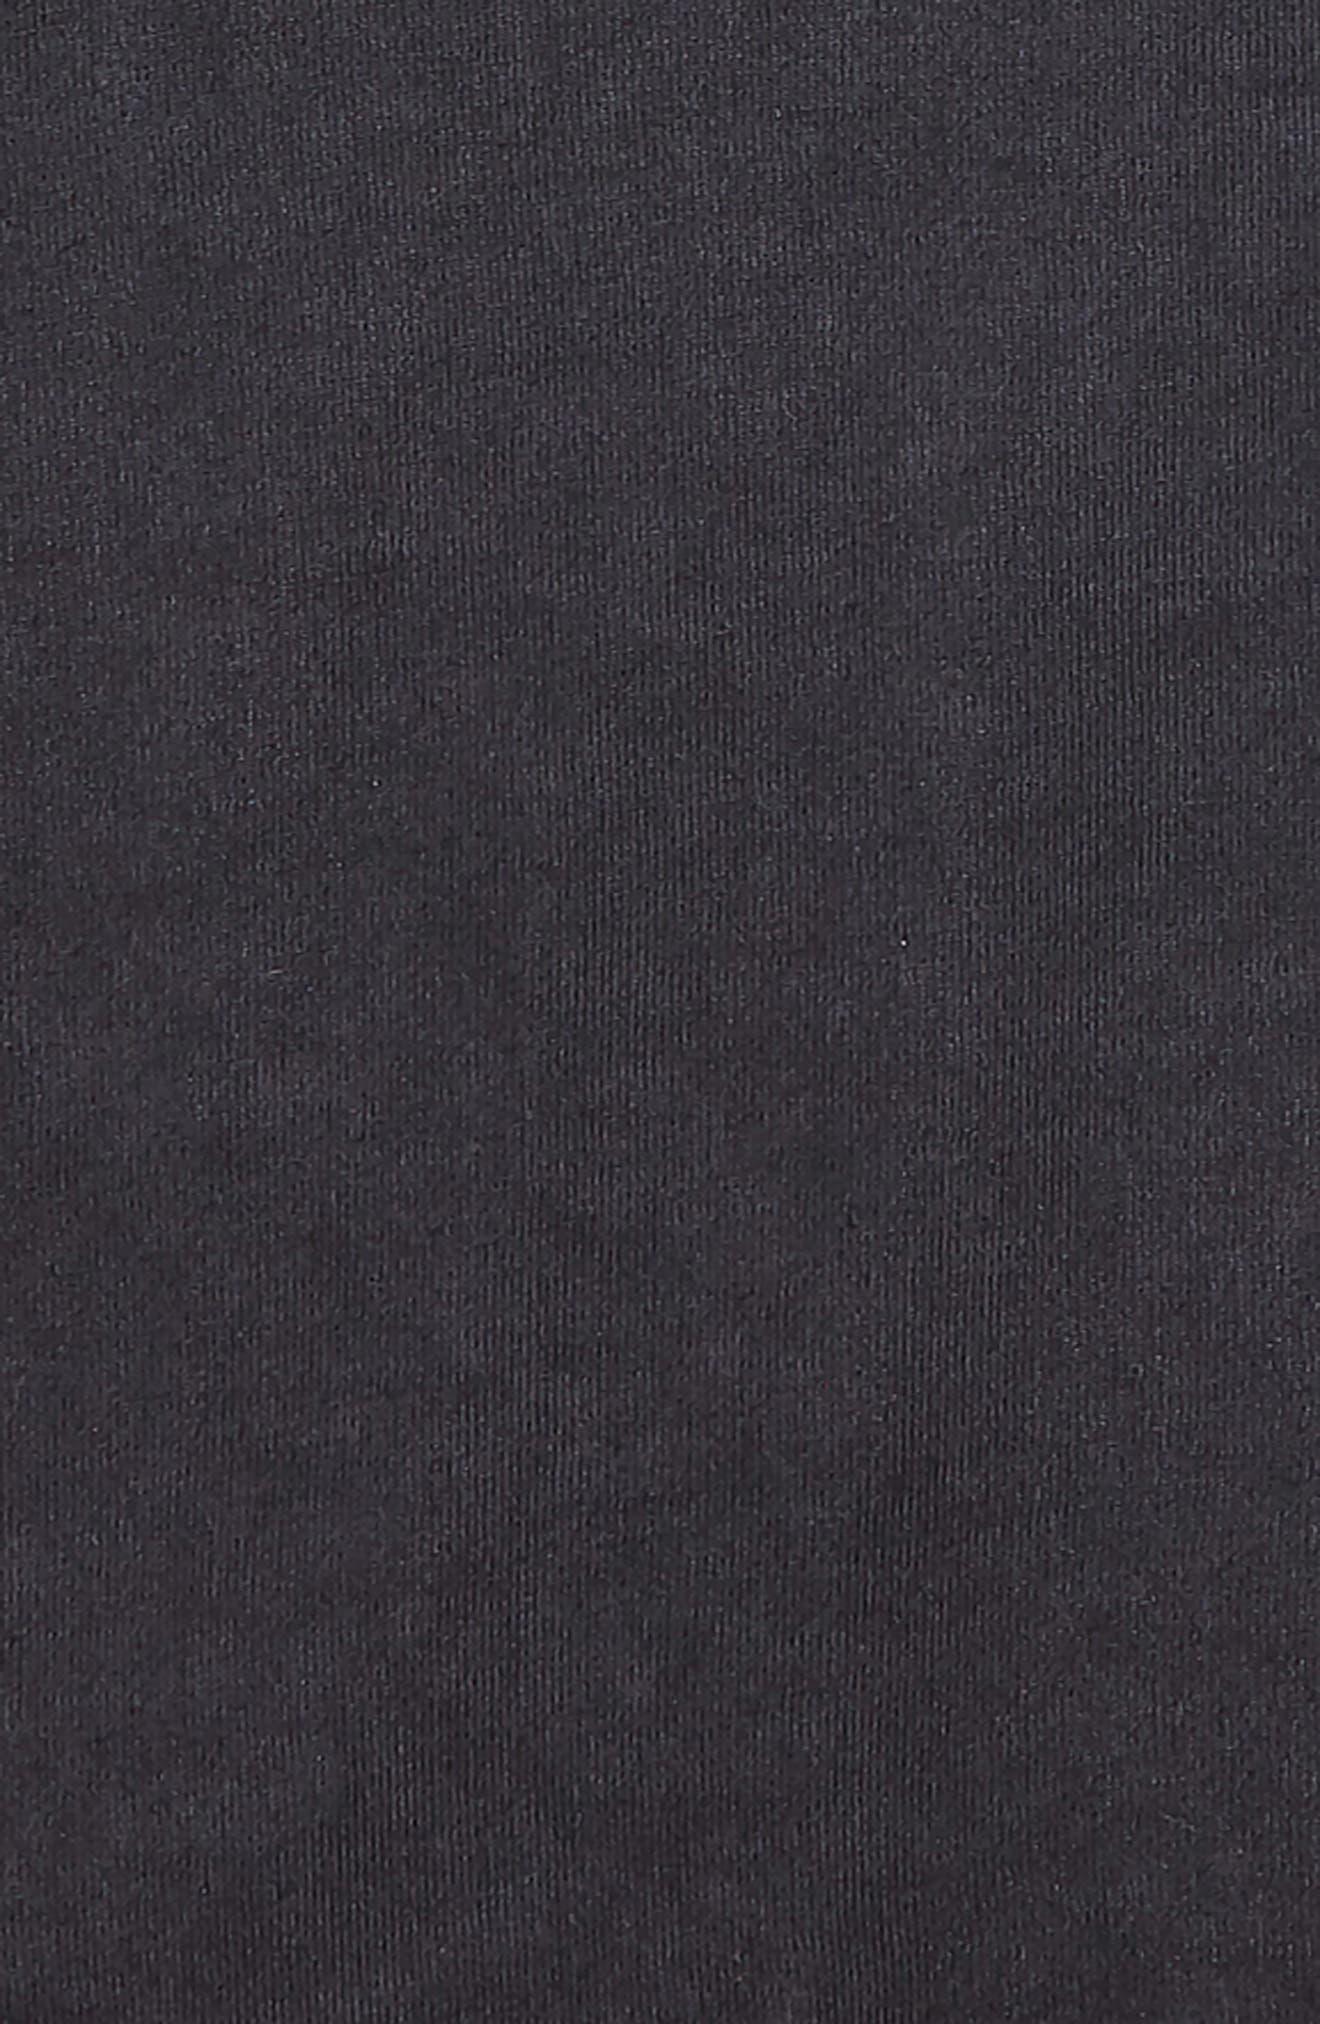 Ninja Hooded Shirt,                             Alternate thumbnail 2, color,                             DYED BLACK